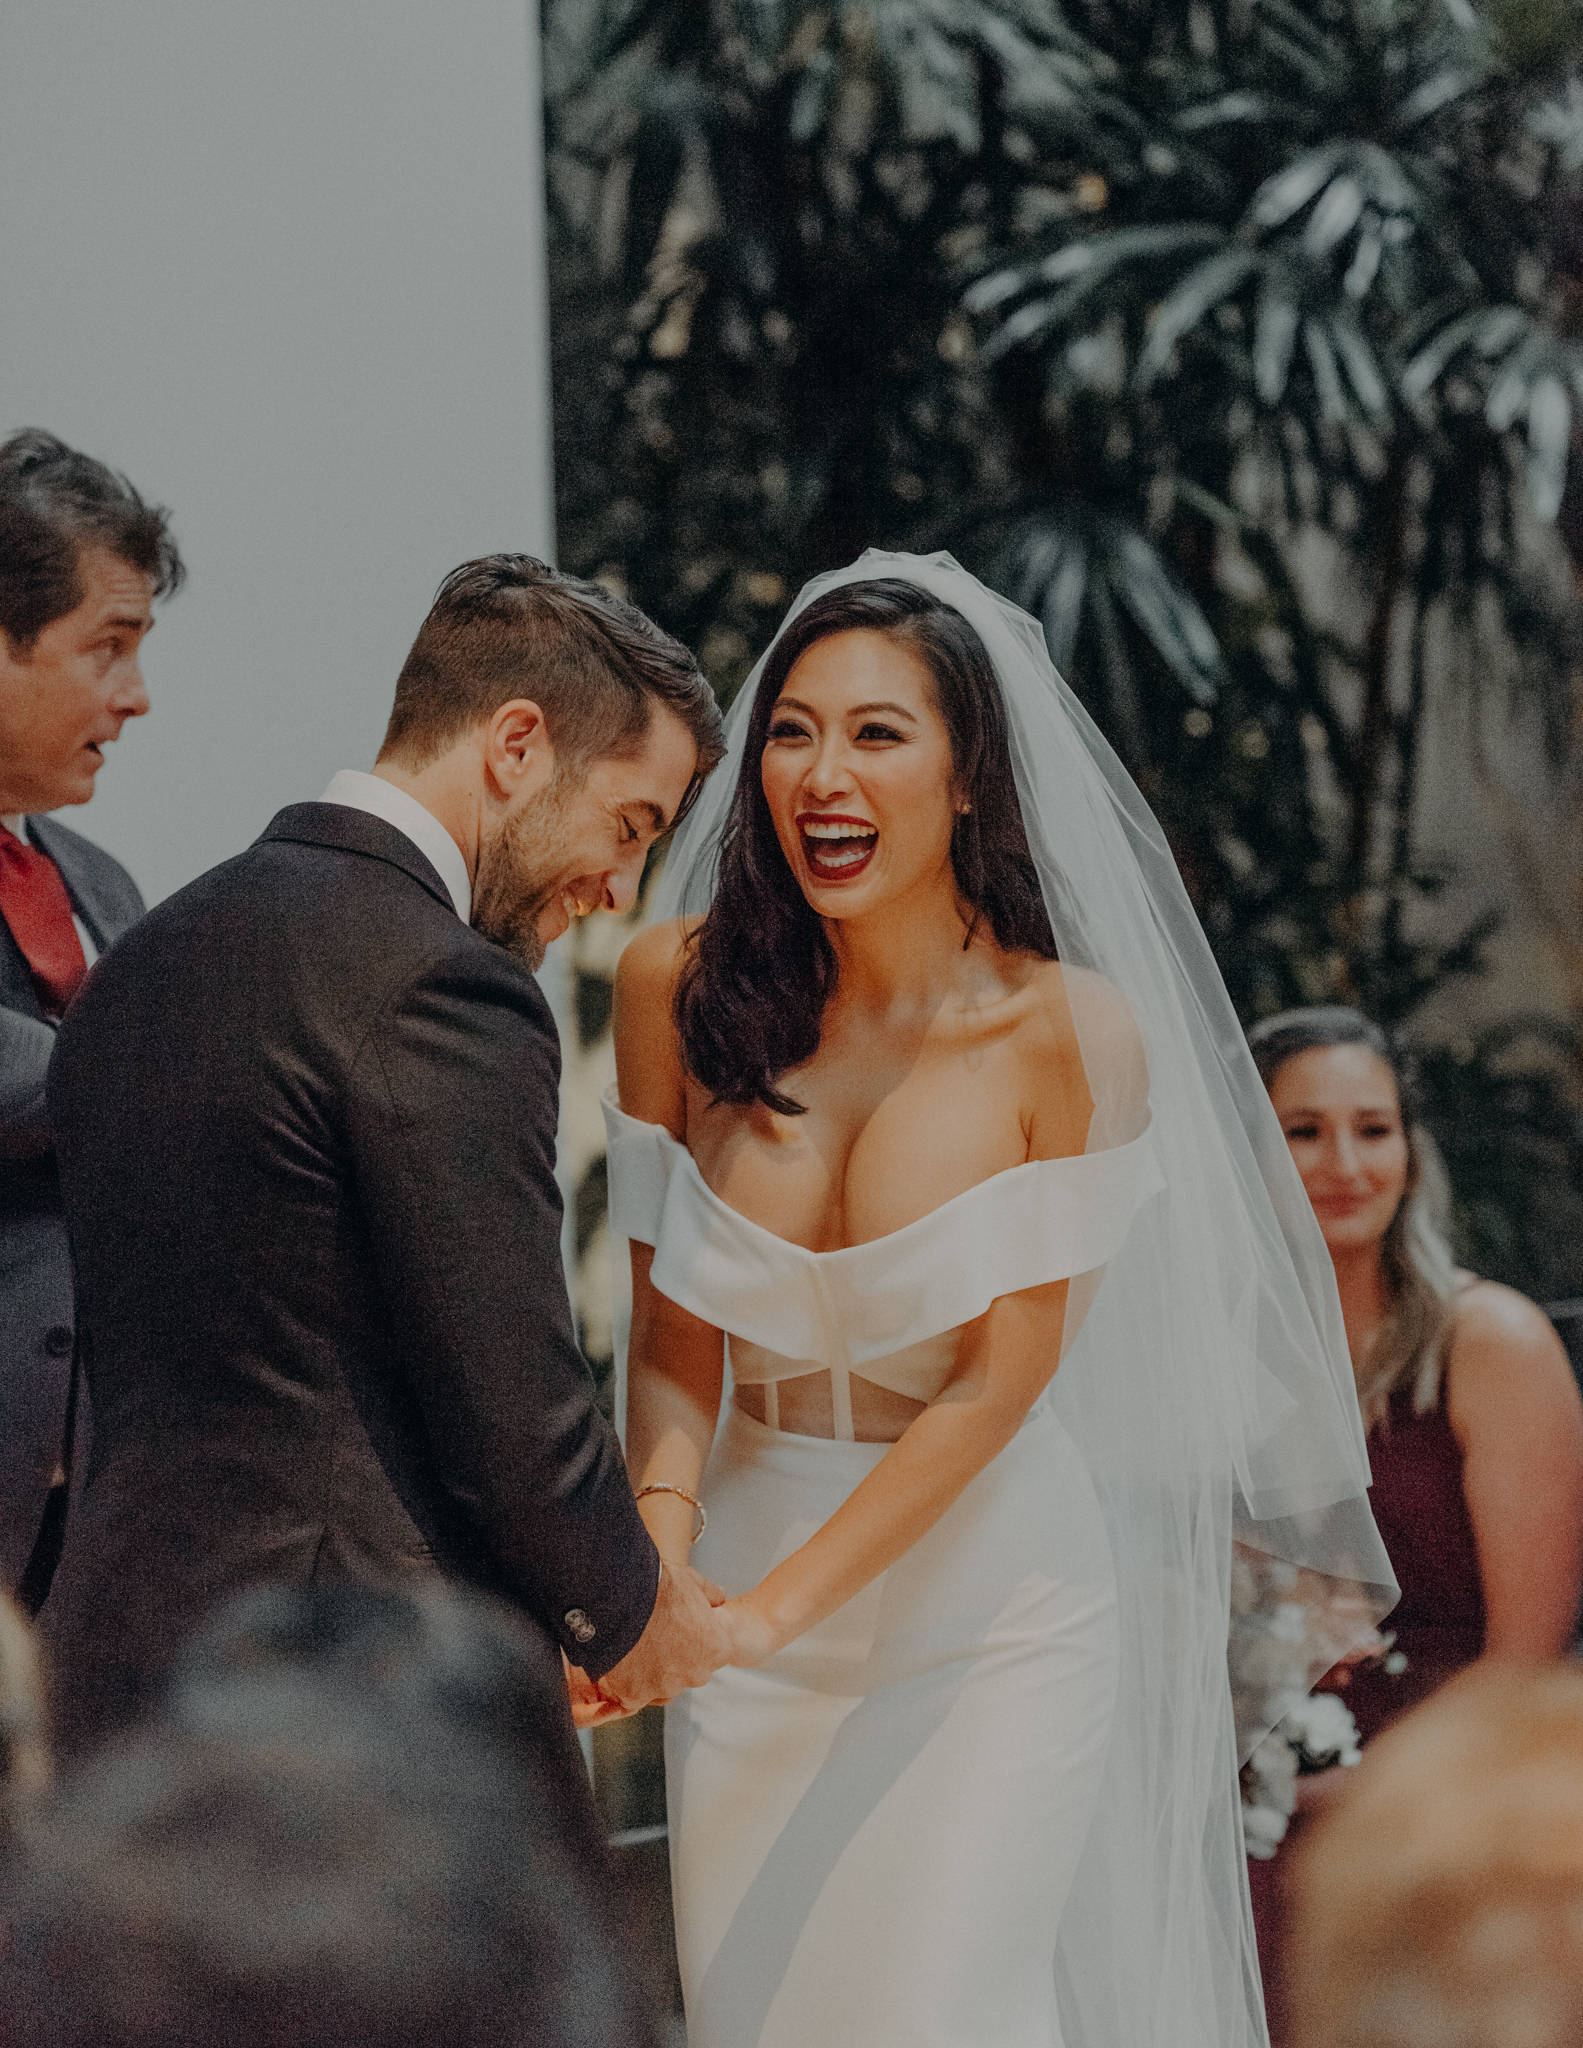 Wedding Photo LA - wedding photographer in los angeles - millwick wedding venue -isaiahandtaylor.com-096.jpg